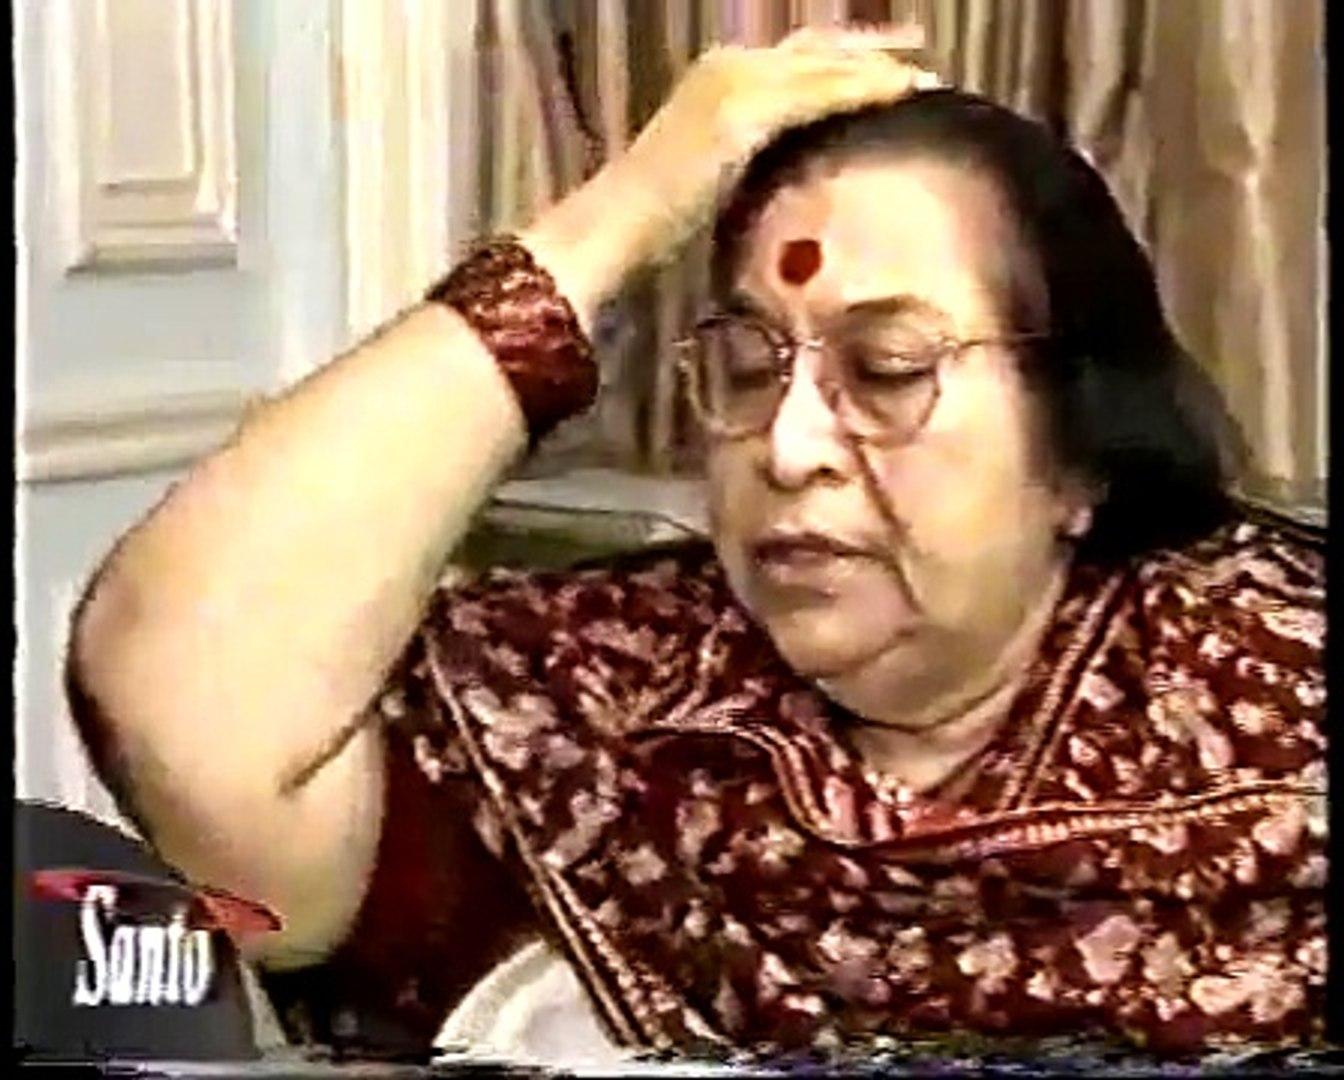 1995-0826 H.H. Shri Mataji Nirmala Devi, TV interview by Santo Biasatti in Argentina